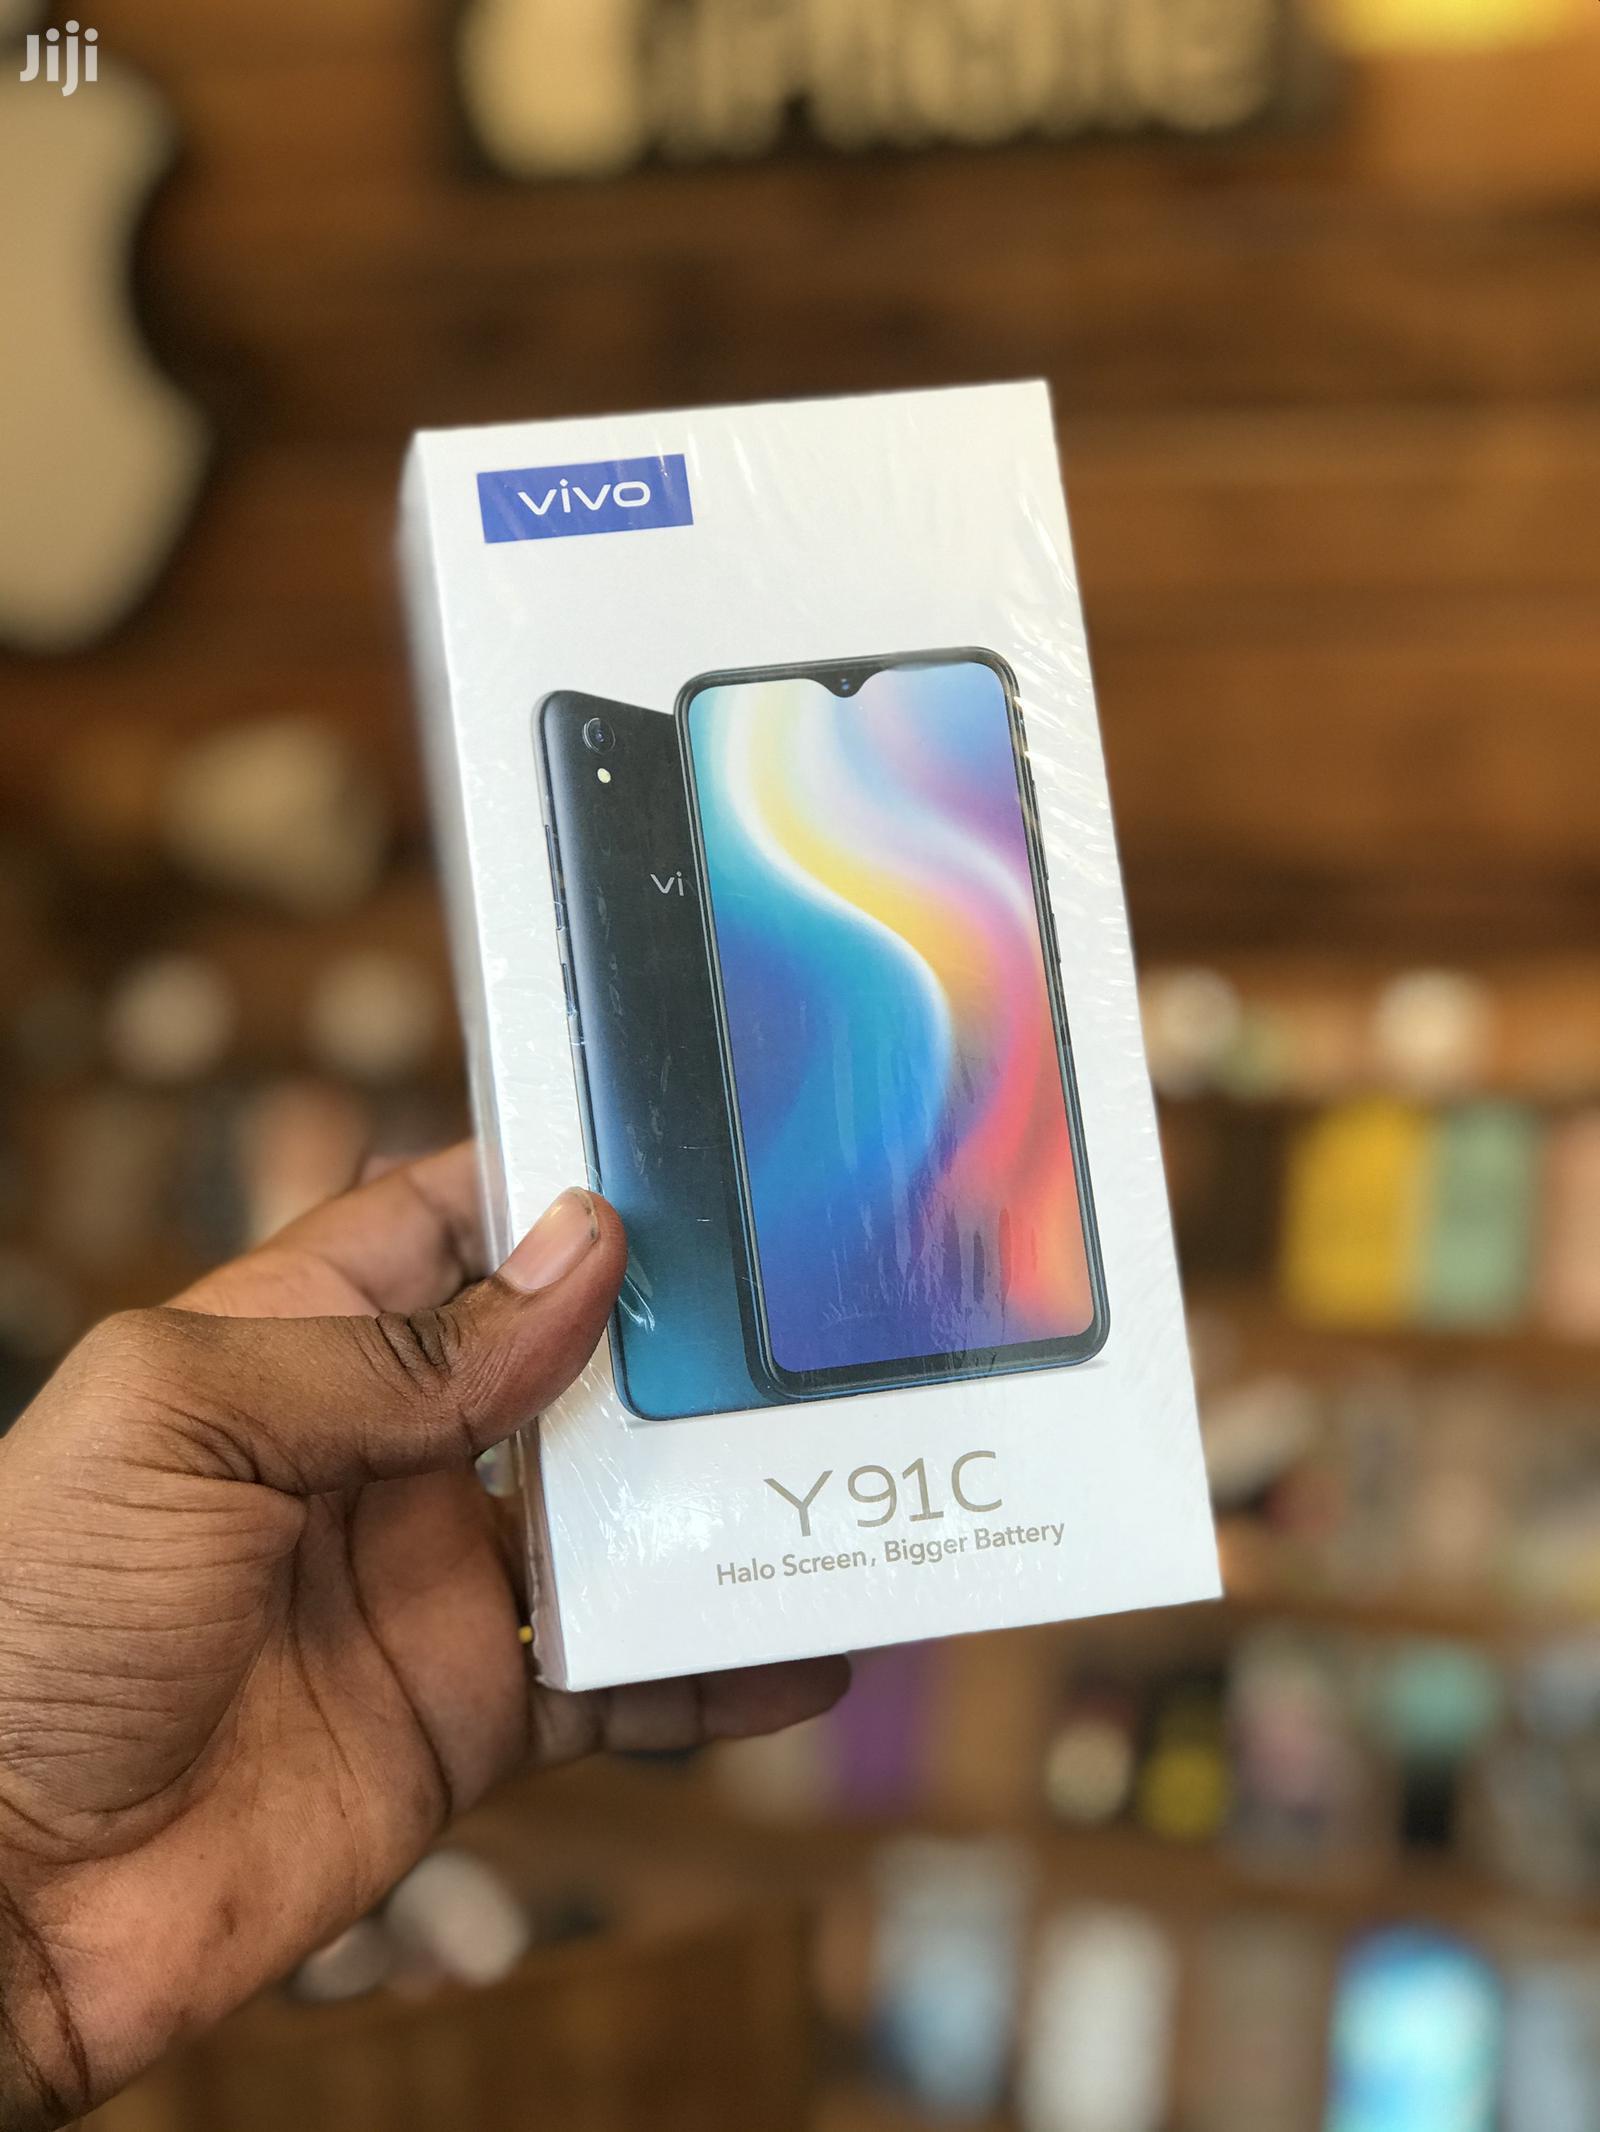 Archive: New Vivo Y91c 32 GB Blue